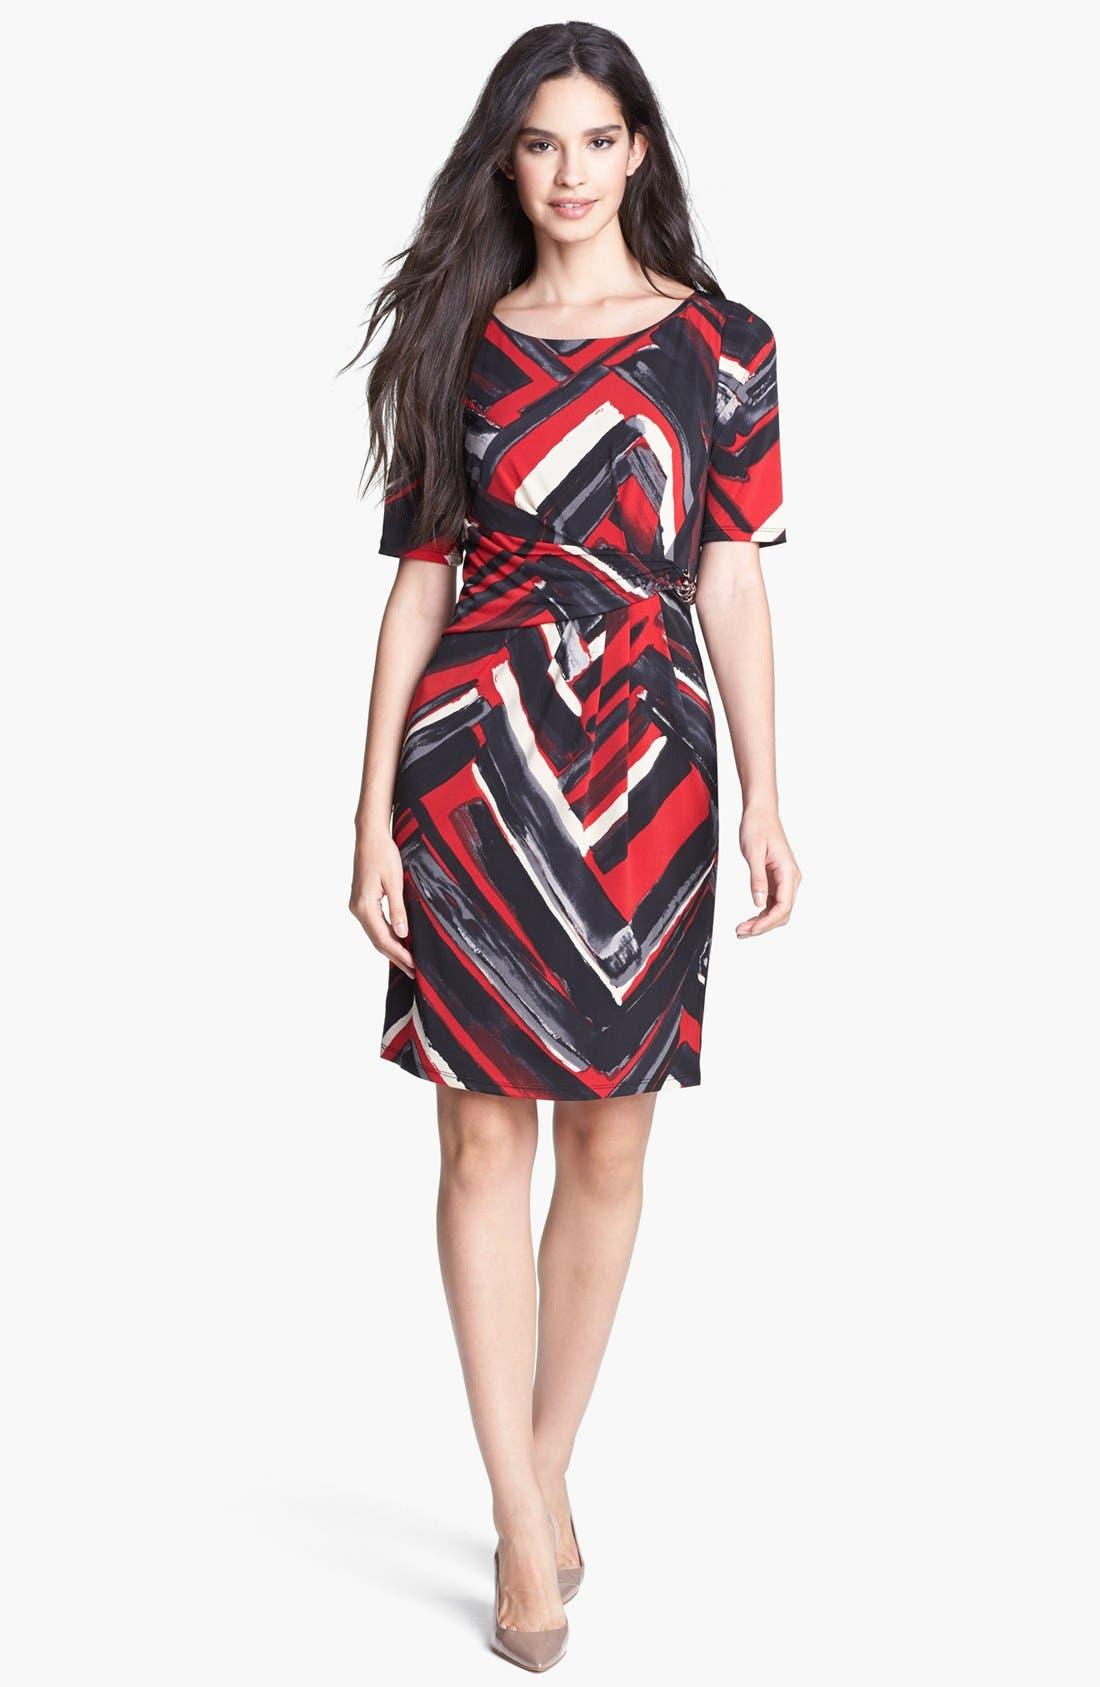 Alternate Image 1 Selected - Ellen Tracy Print Side Tie Jersey Dress (Petite)